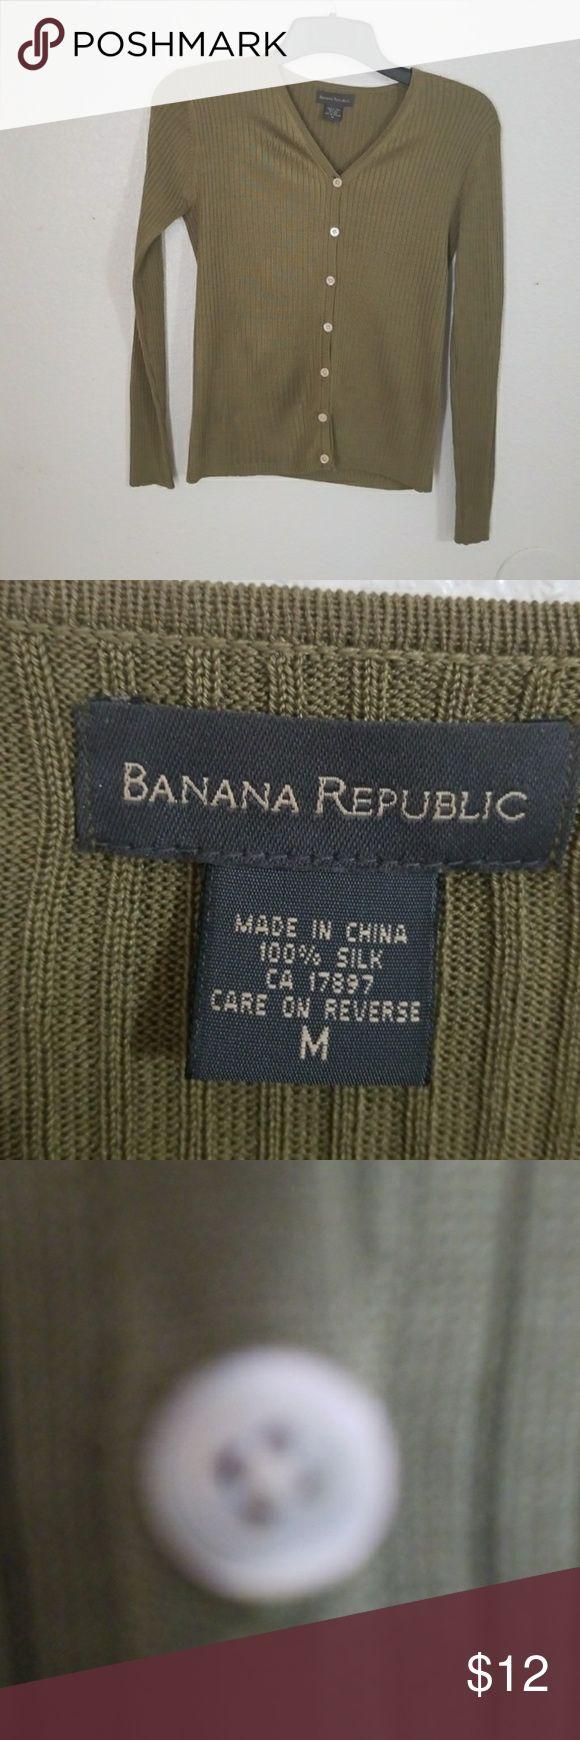 BANANA REPUBLIC   Cardigan Sweater 100% Silk Banana Republic L Cardigan Sweater V-neck Rib Knit 100% Silk Long Sleeve,  Like New Ribbed Pattern All Season Medium is Size 8/10 Waist 29/30 Bust 36/37 Hip 39/40 Sleeve Length 33 Banana Republic Sweaters Cardigans